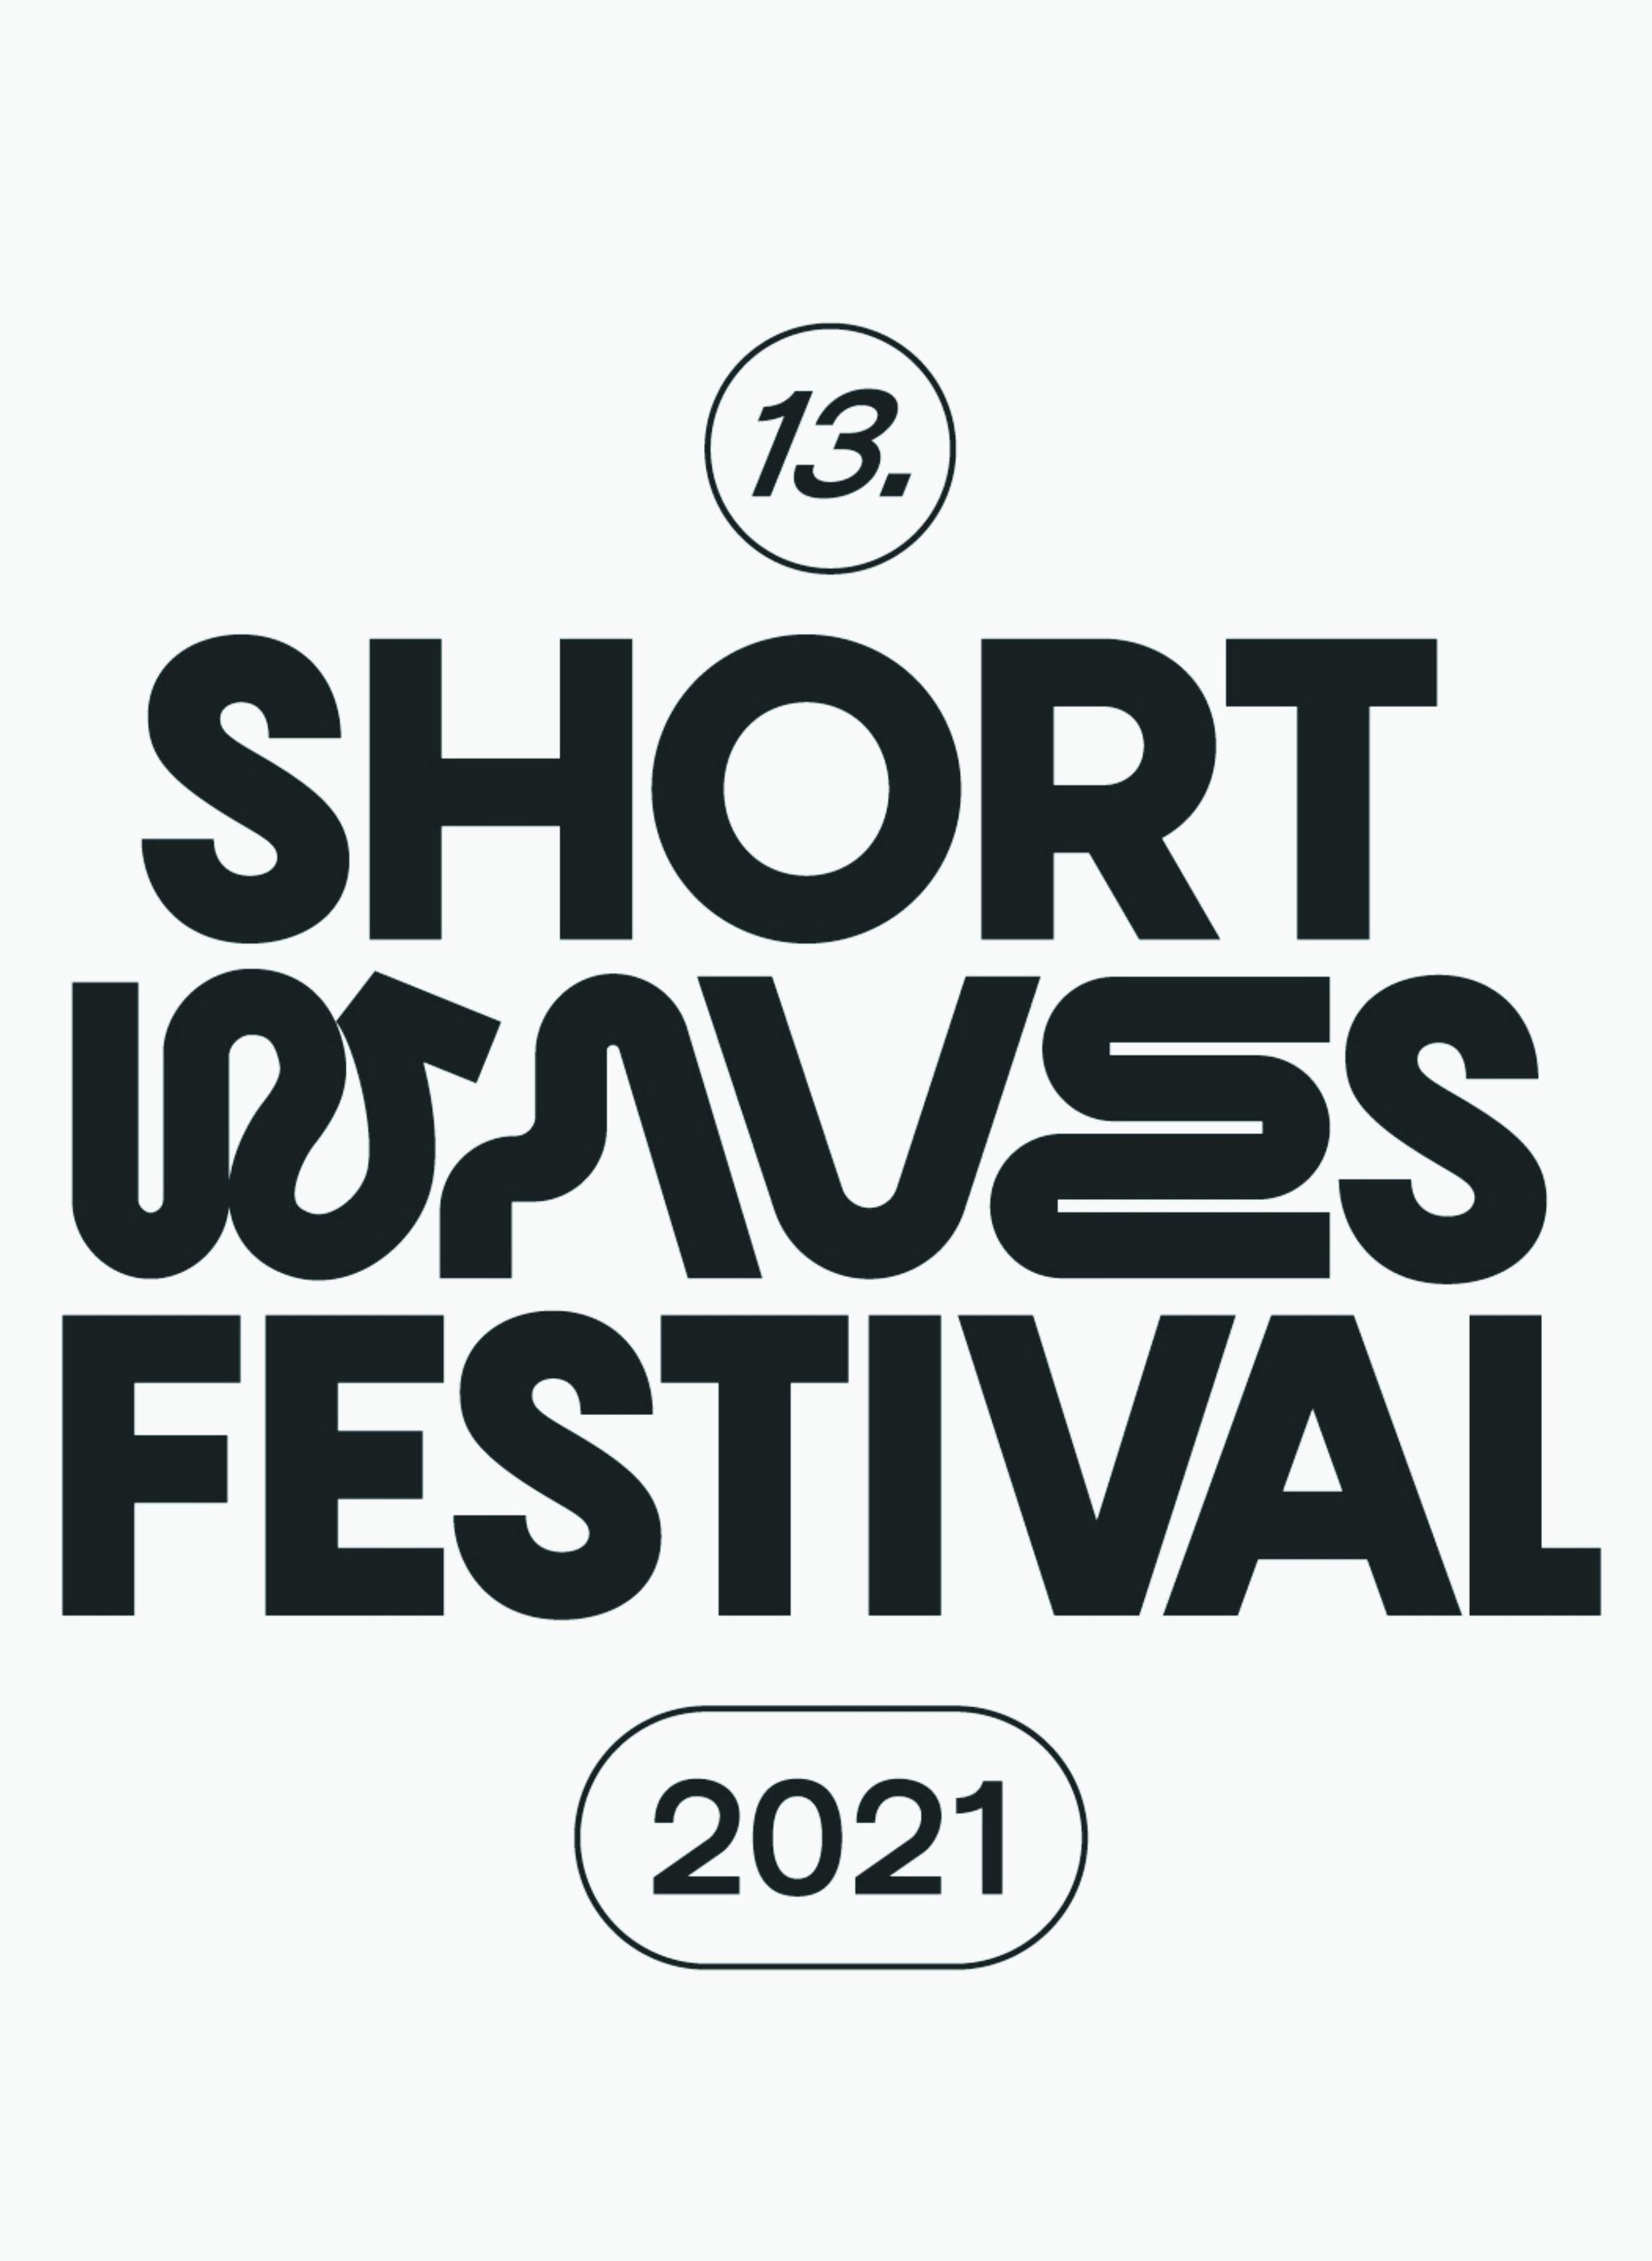 Short Waves Festival 2021 - SWF Awarded: UV + DWC